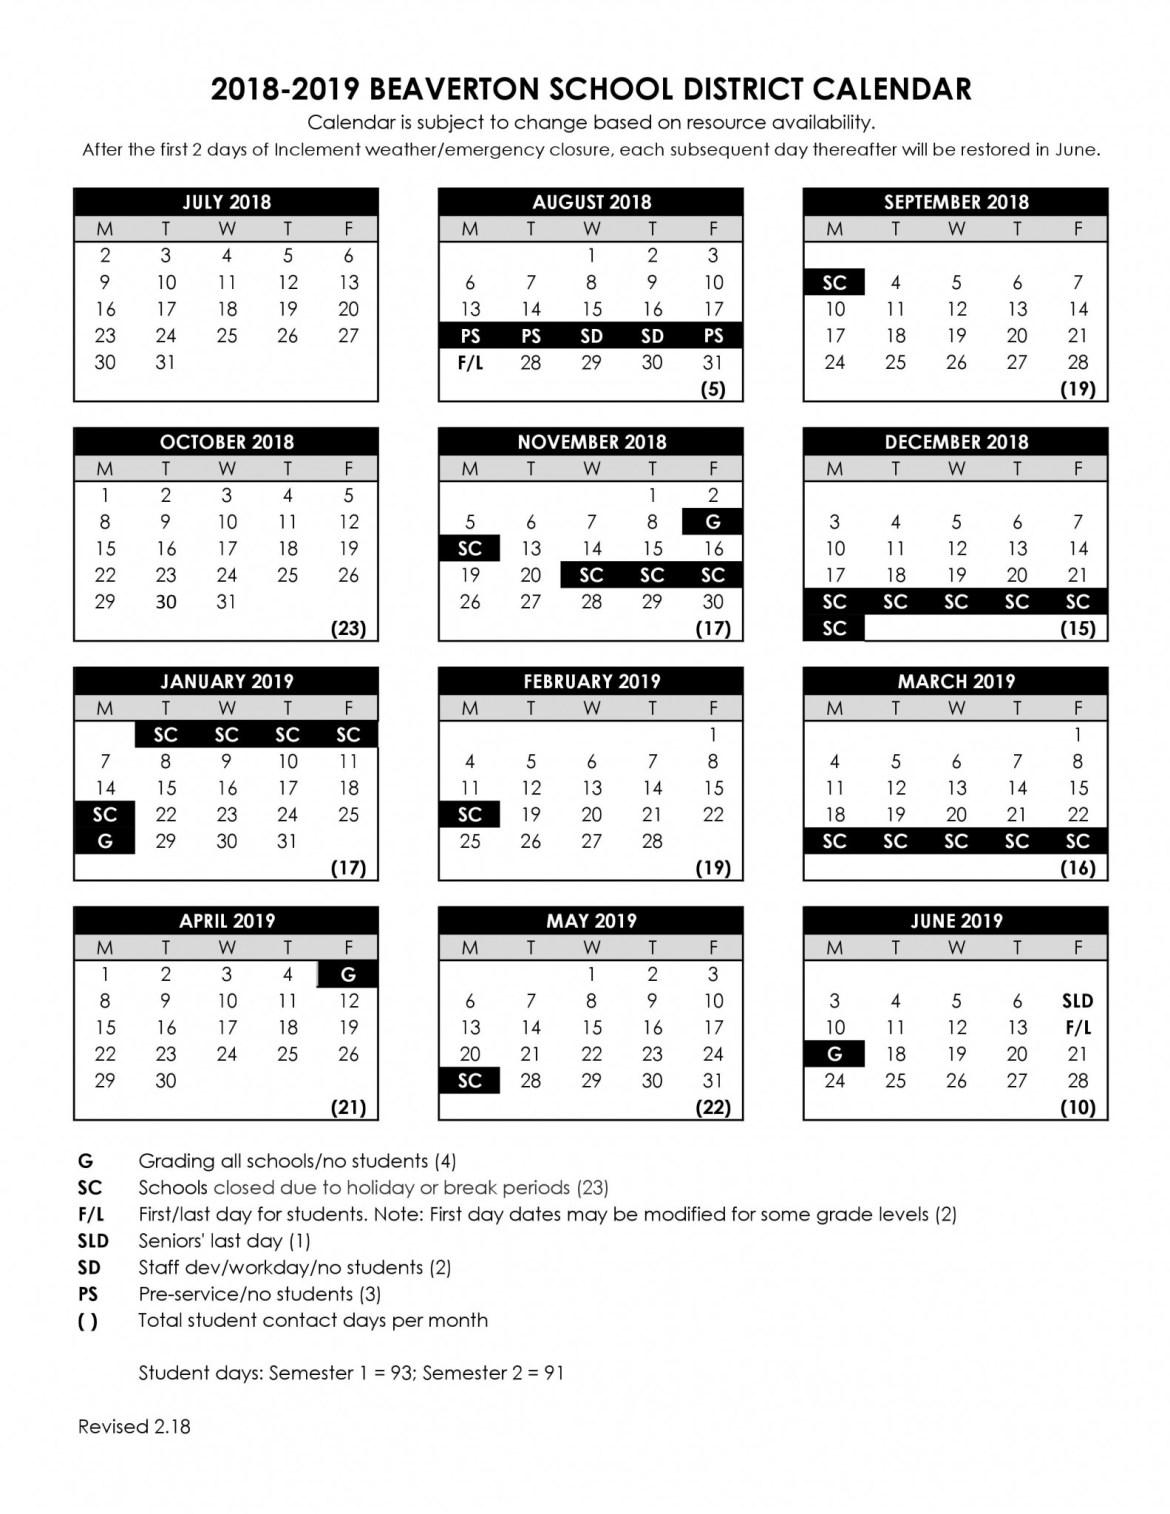 2018 Beaverton School District Calendar